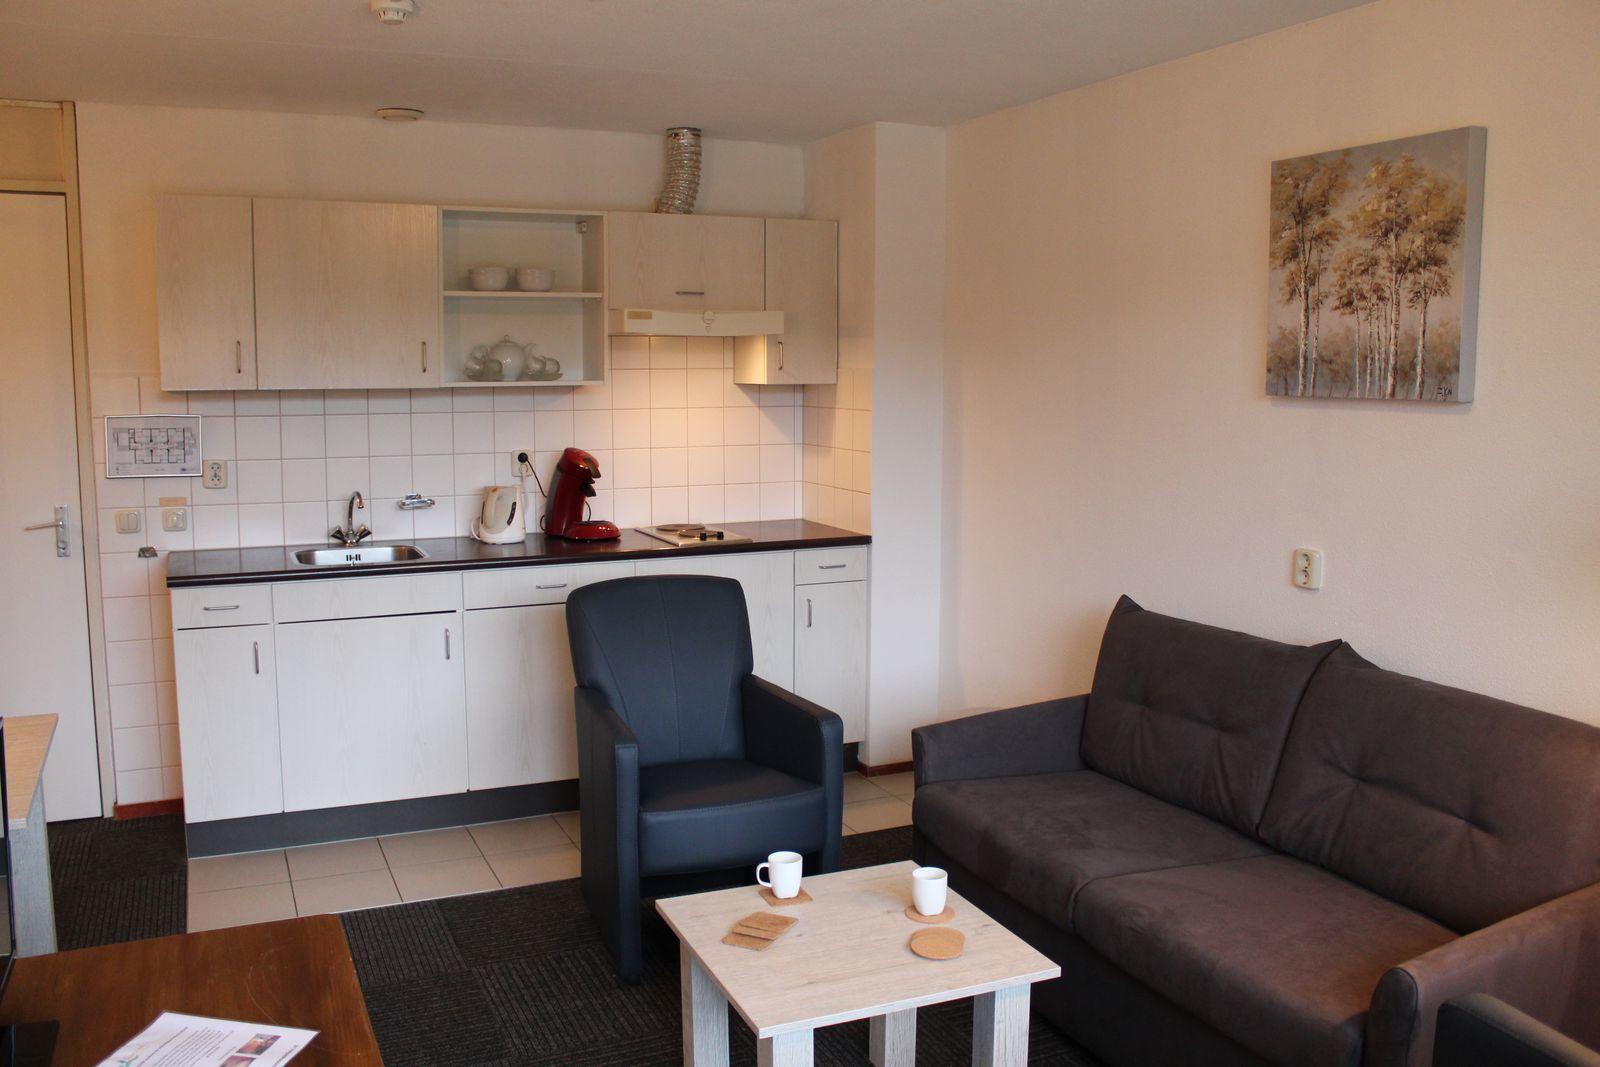 2-person apartment